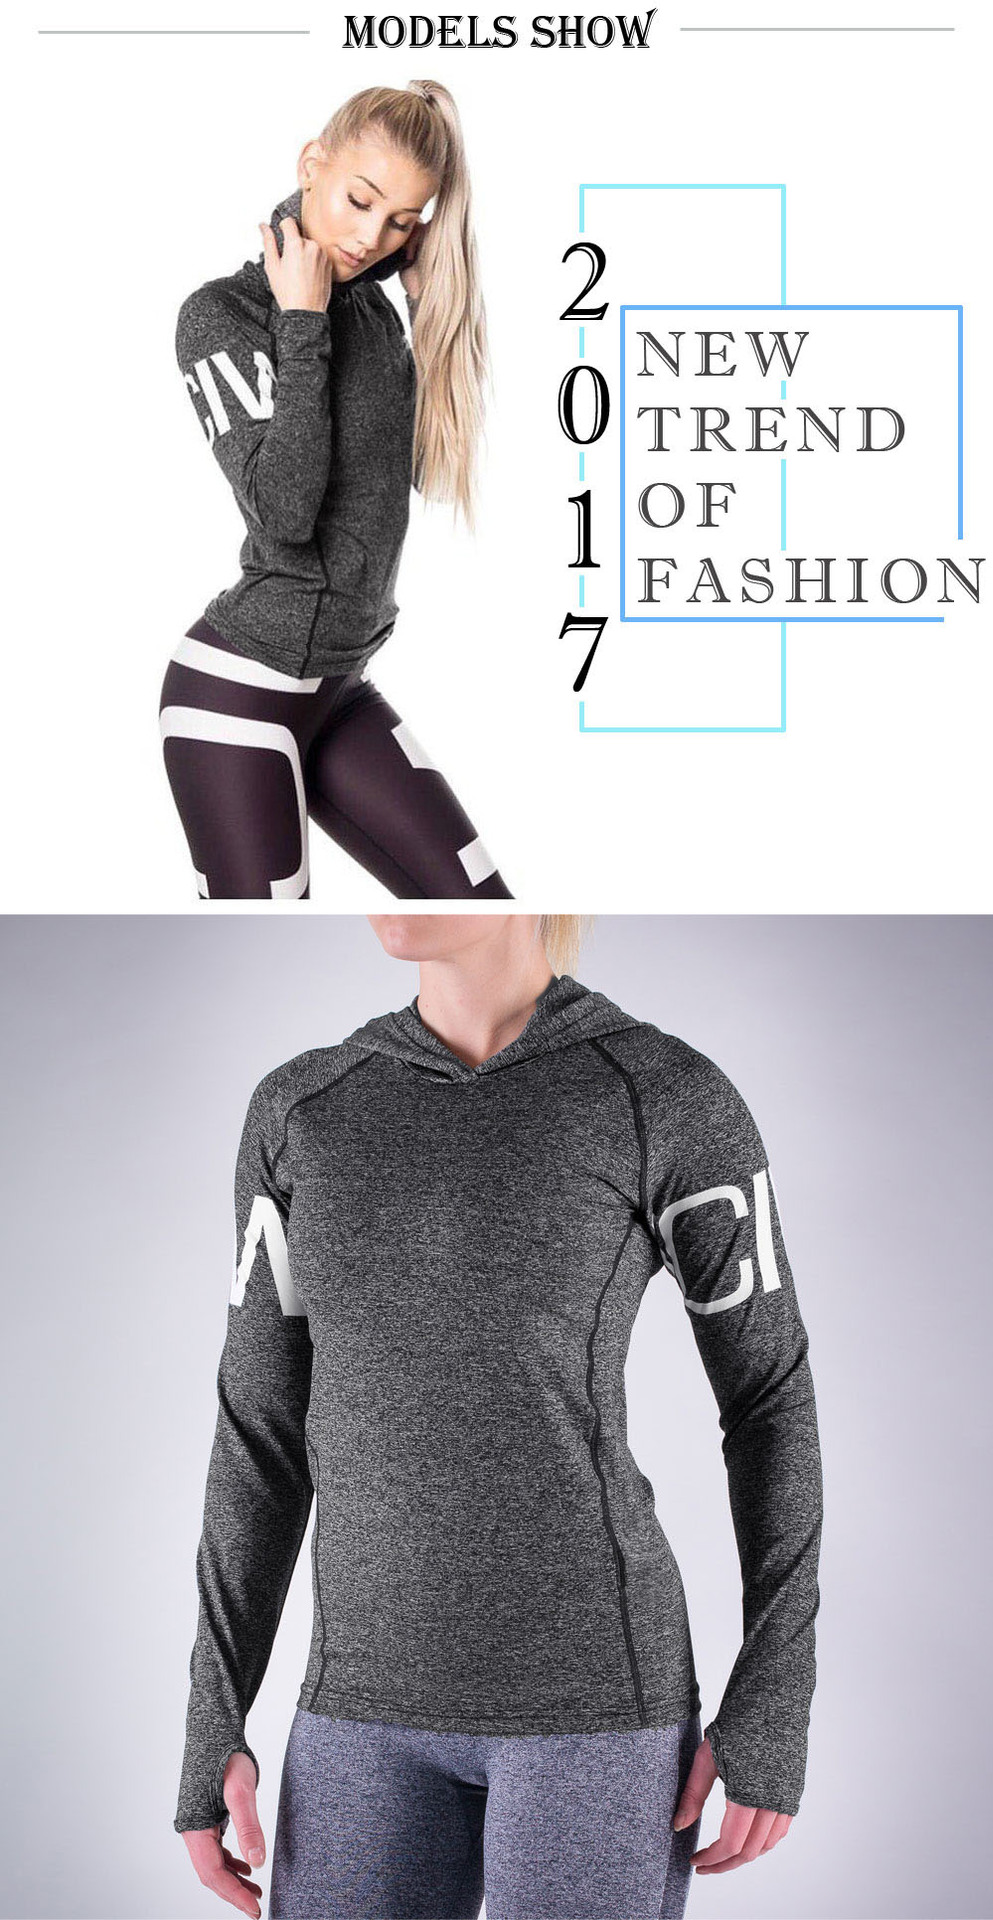 Fitness Breathable Sportswear Women T Shirt Sport Suit Yoga ShirtsTop Quick-Dry Running Shirt Gym Clothes Sport Shirt Jackets 4